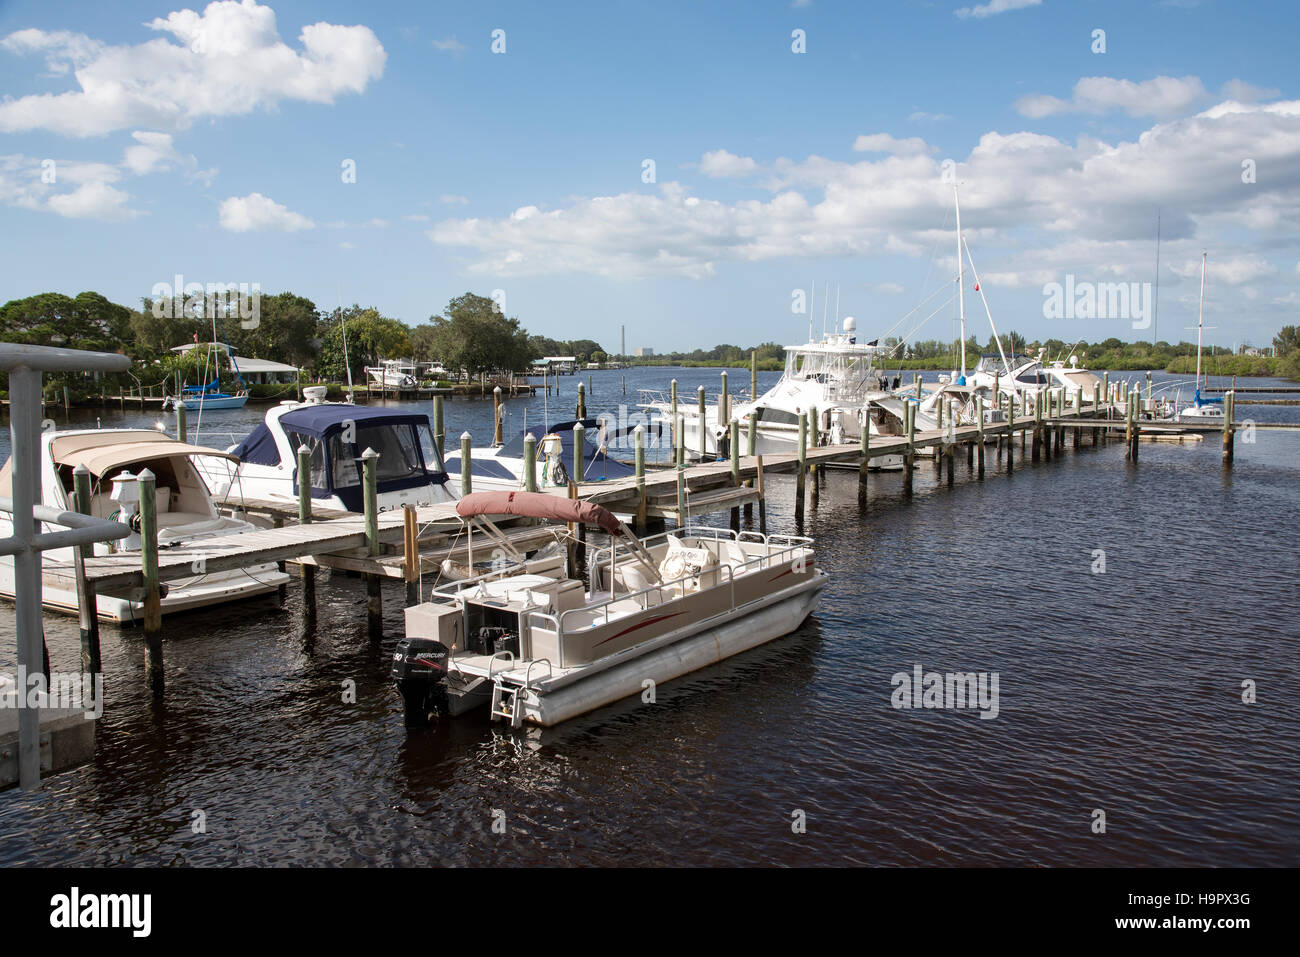 Tarpon Springs Florida USA - An overview of pleasure cruisers docked at Tarpon Bayou Fl US - Stock Image